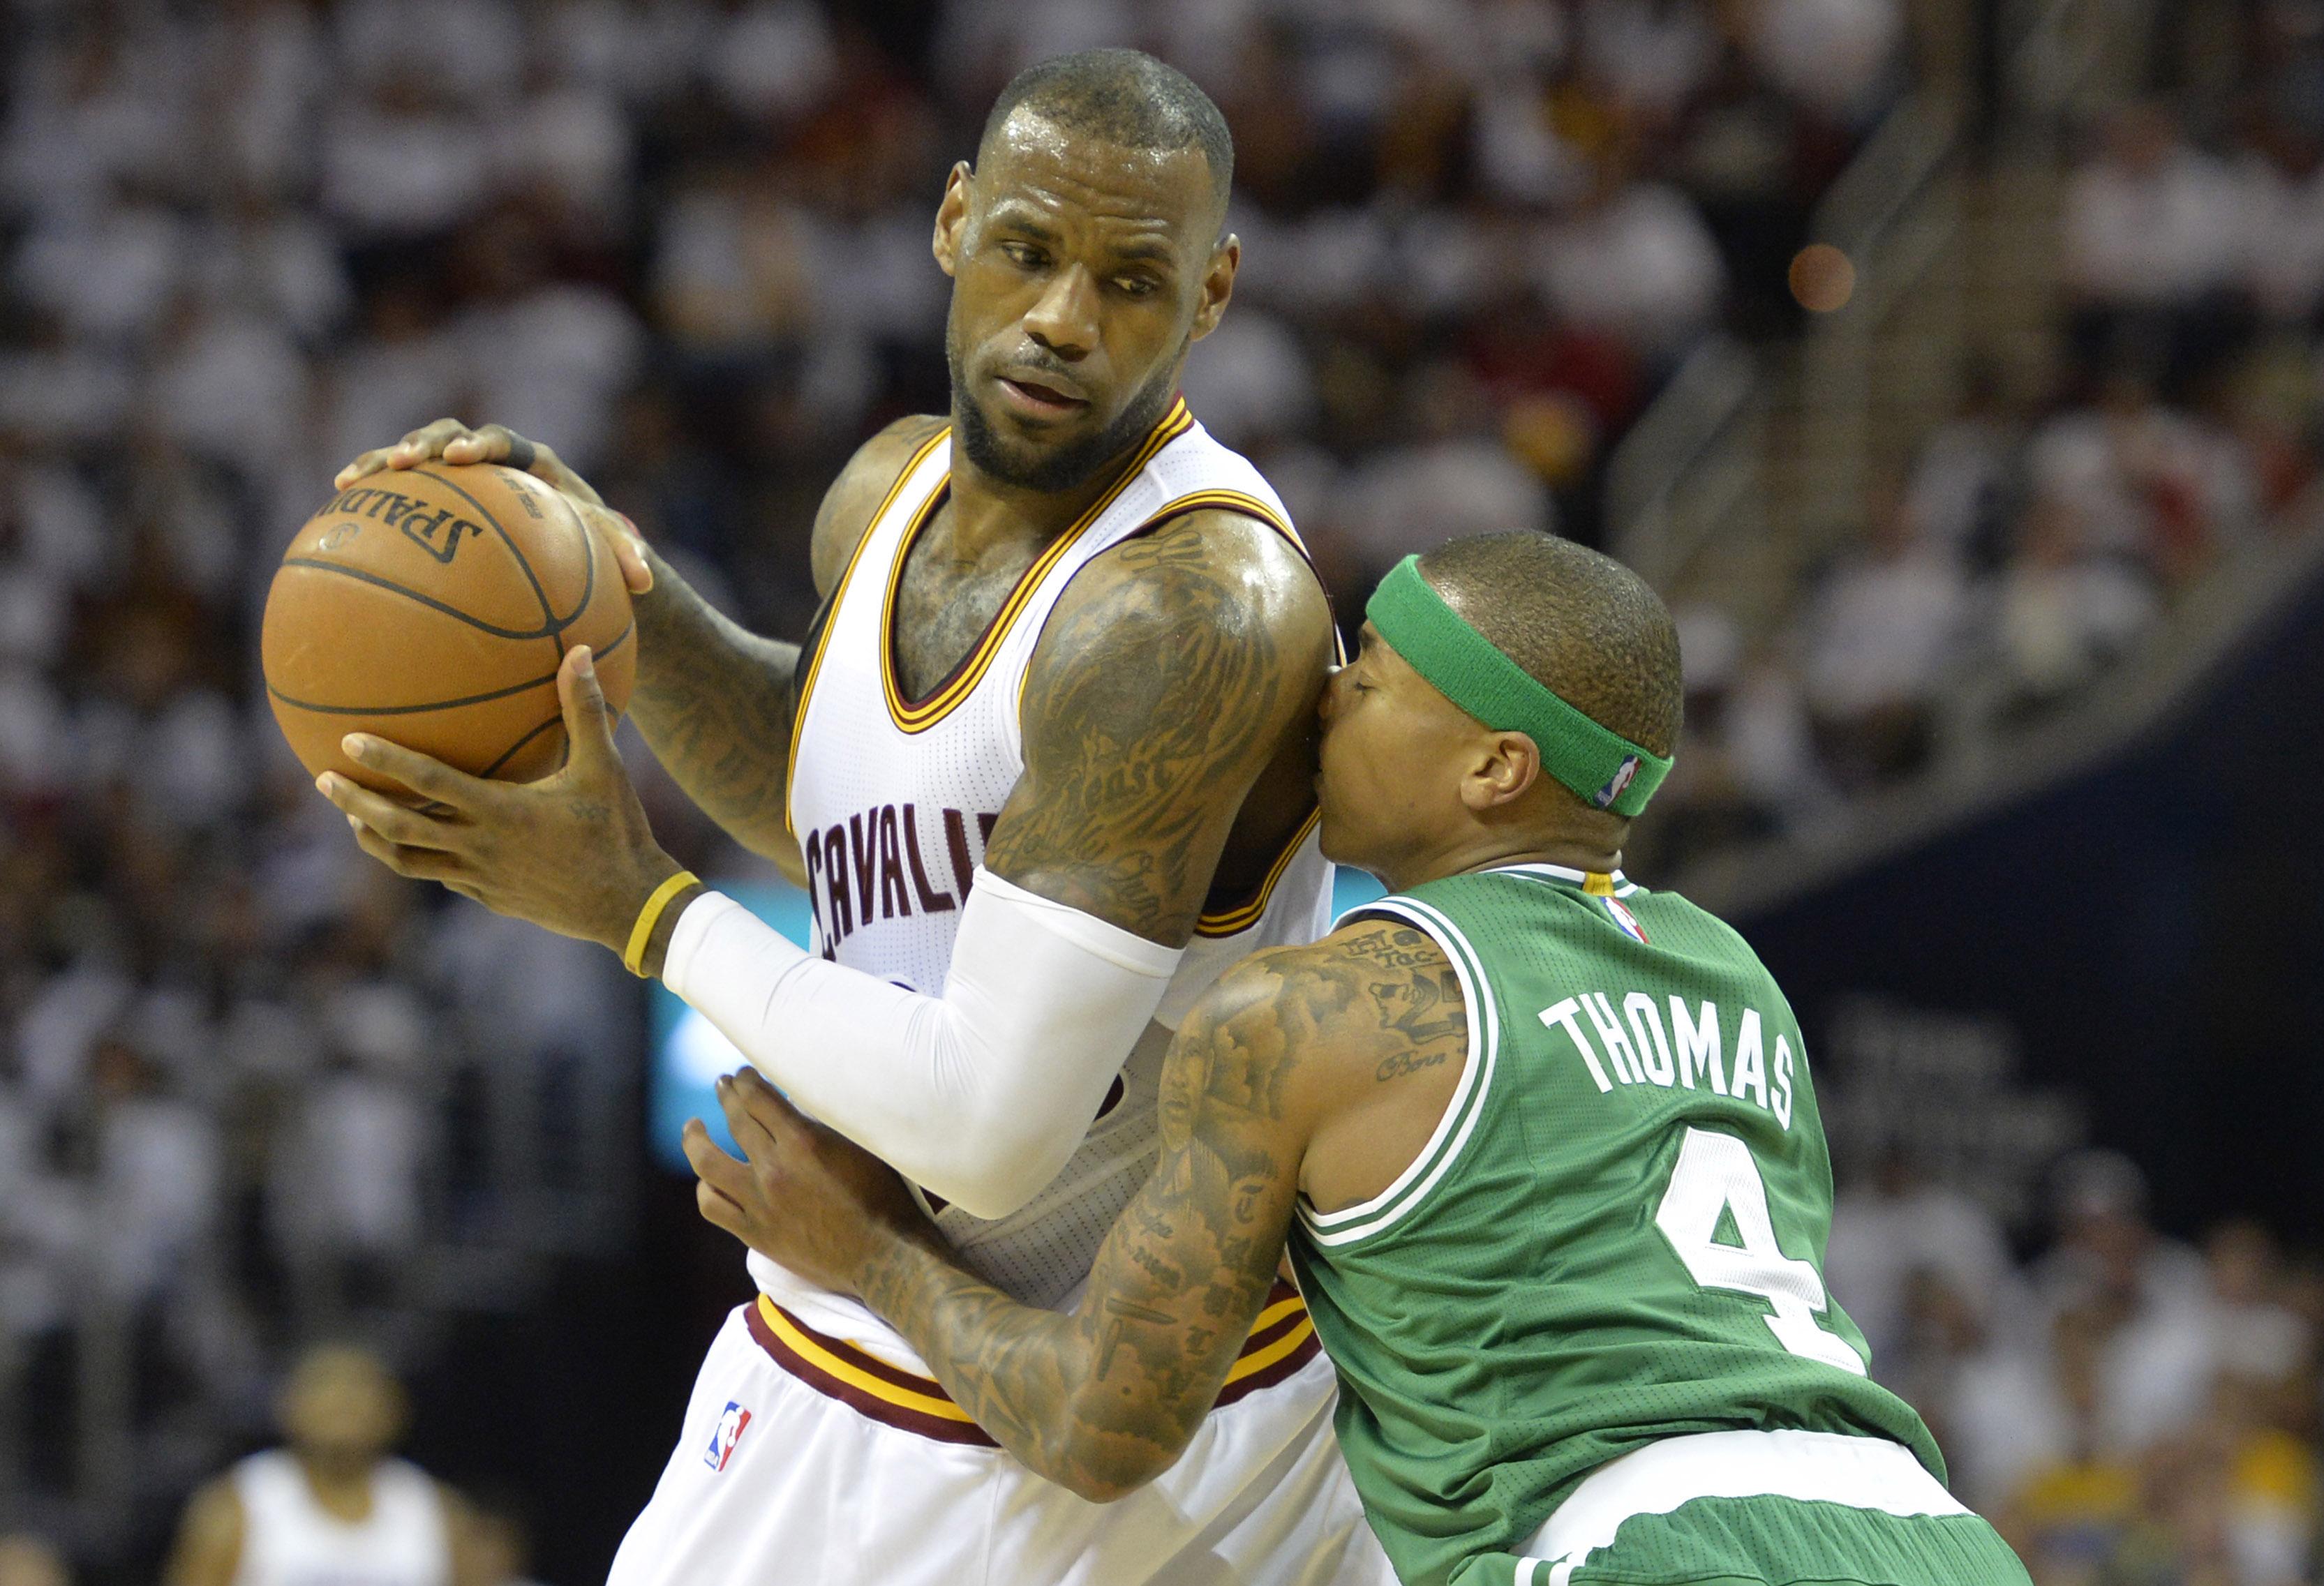 8532497-nba-playoffs-boston-celtics-at-cleveland-cavaliers